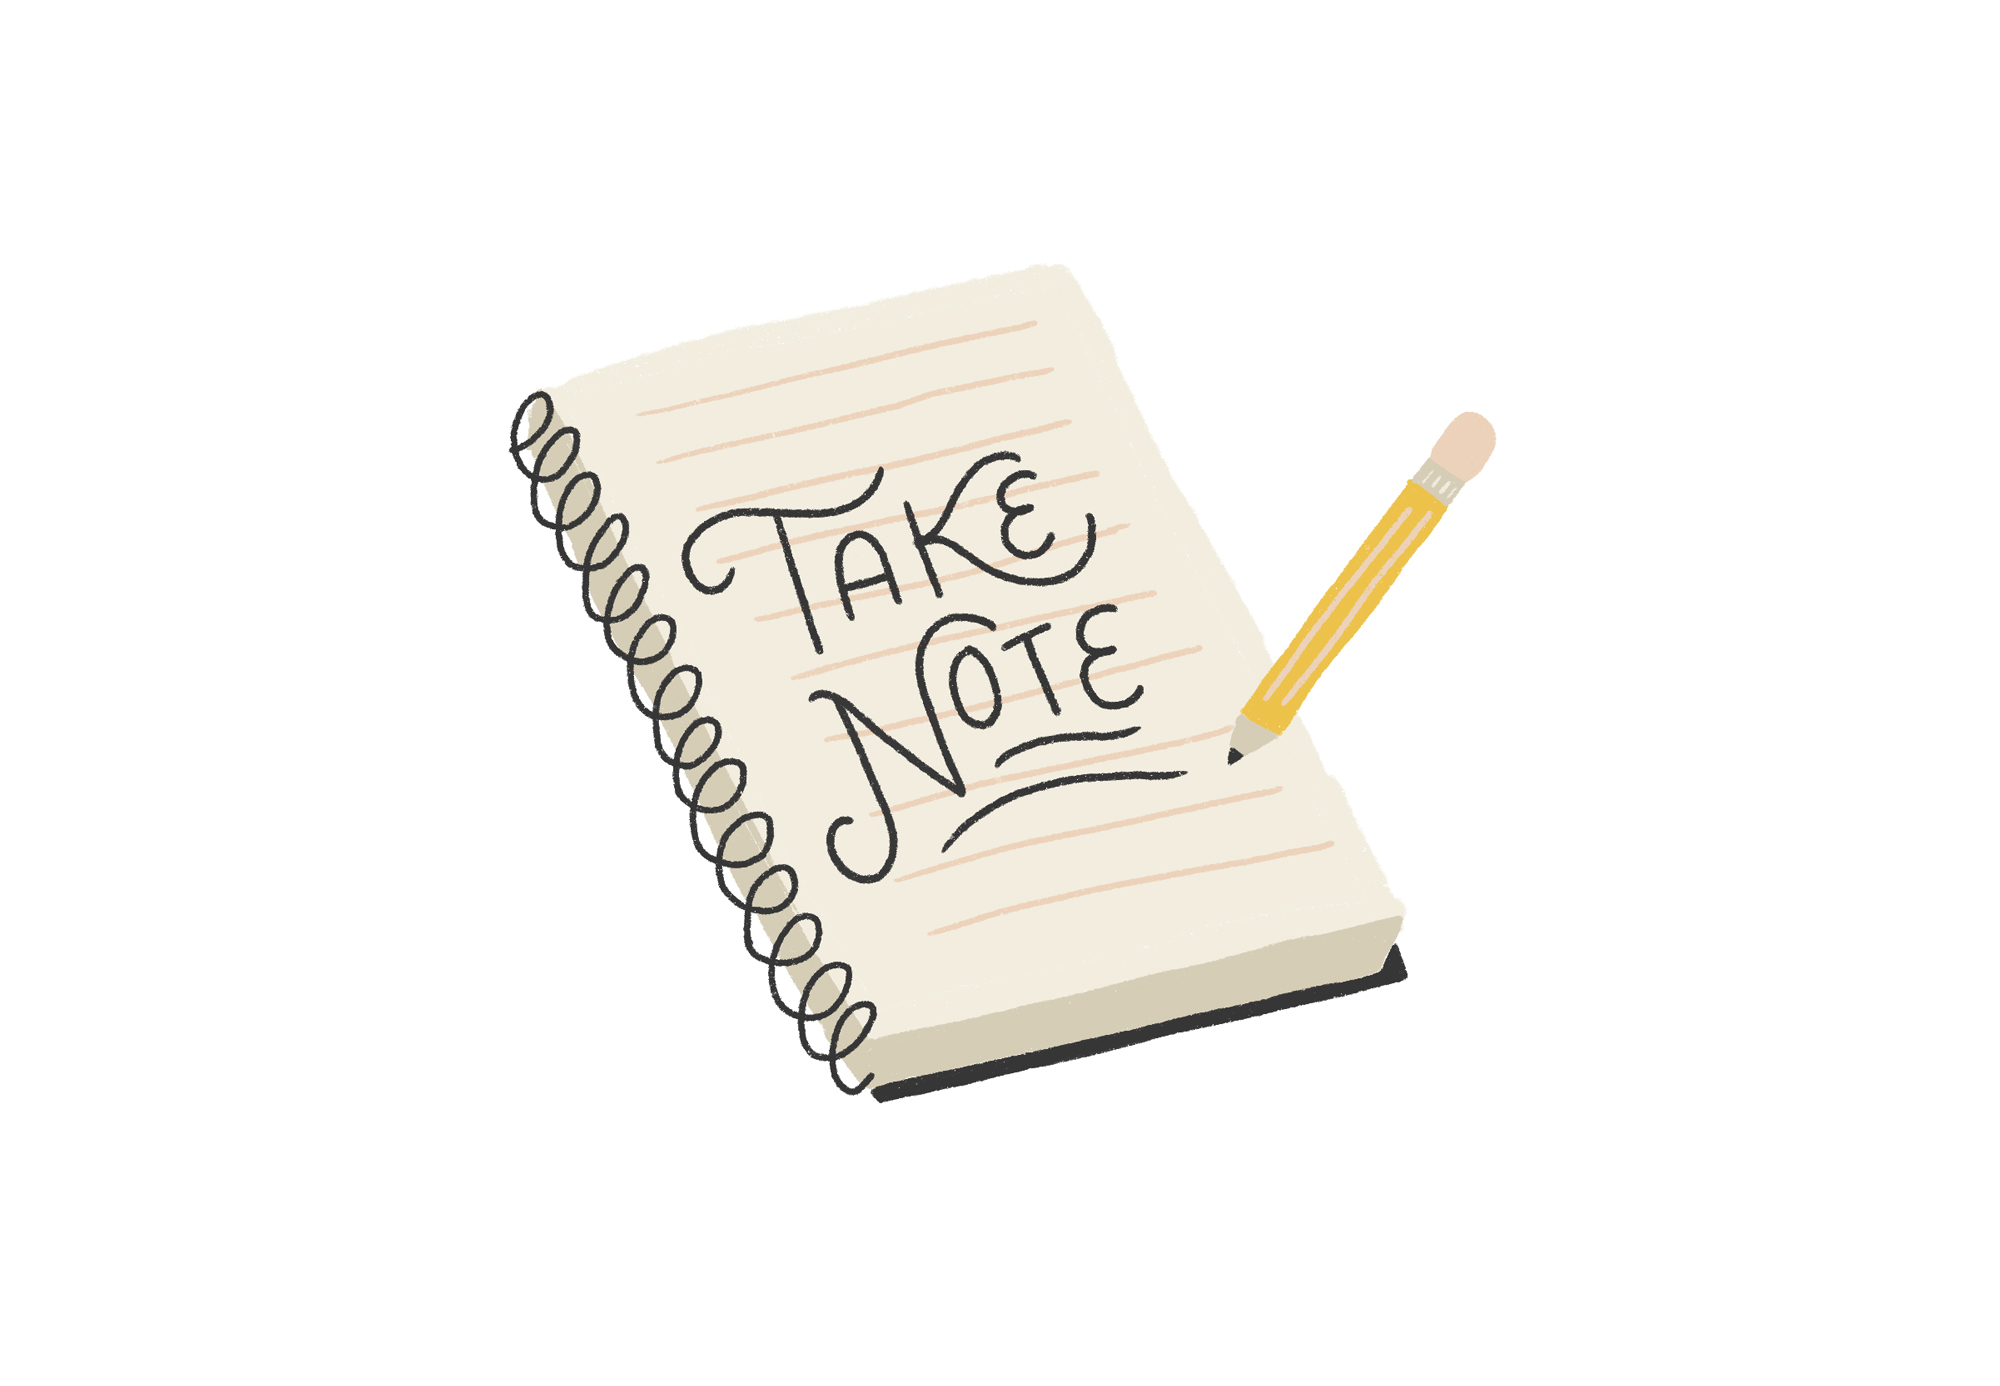 Take_note_book.jpg